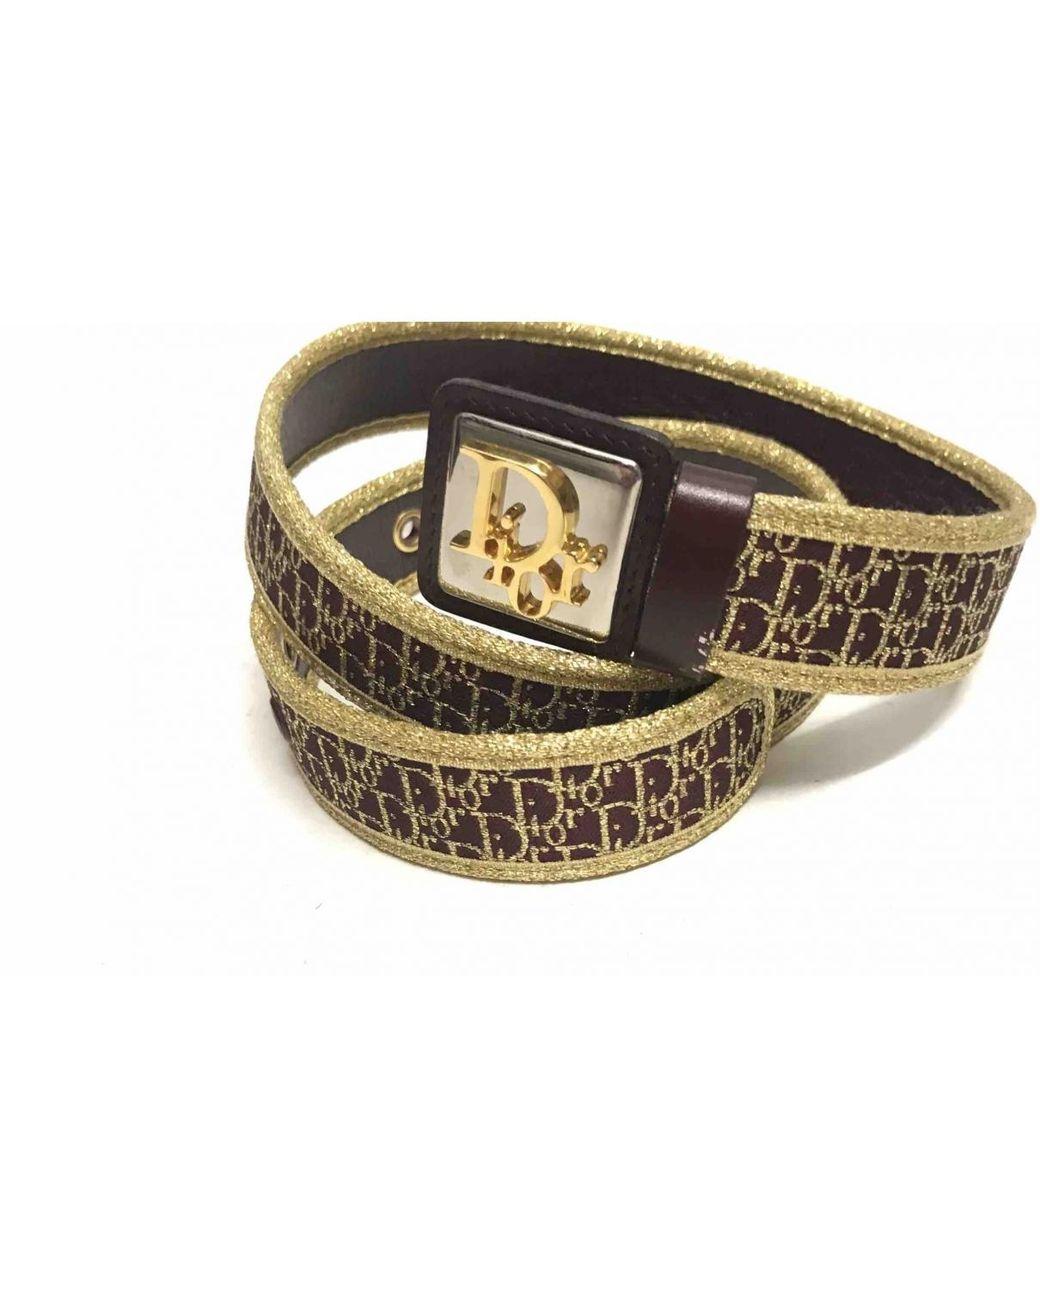 f3c2fdea8f86 Dior Vintage Burgundy Other Belts in Metallic - Lyst